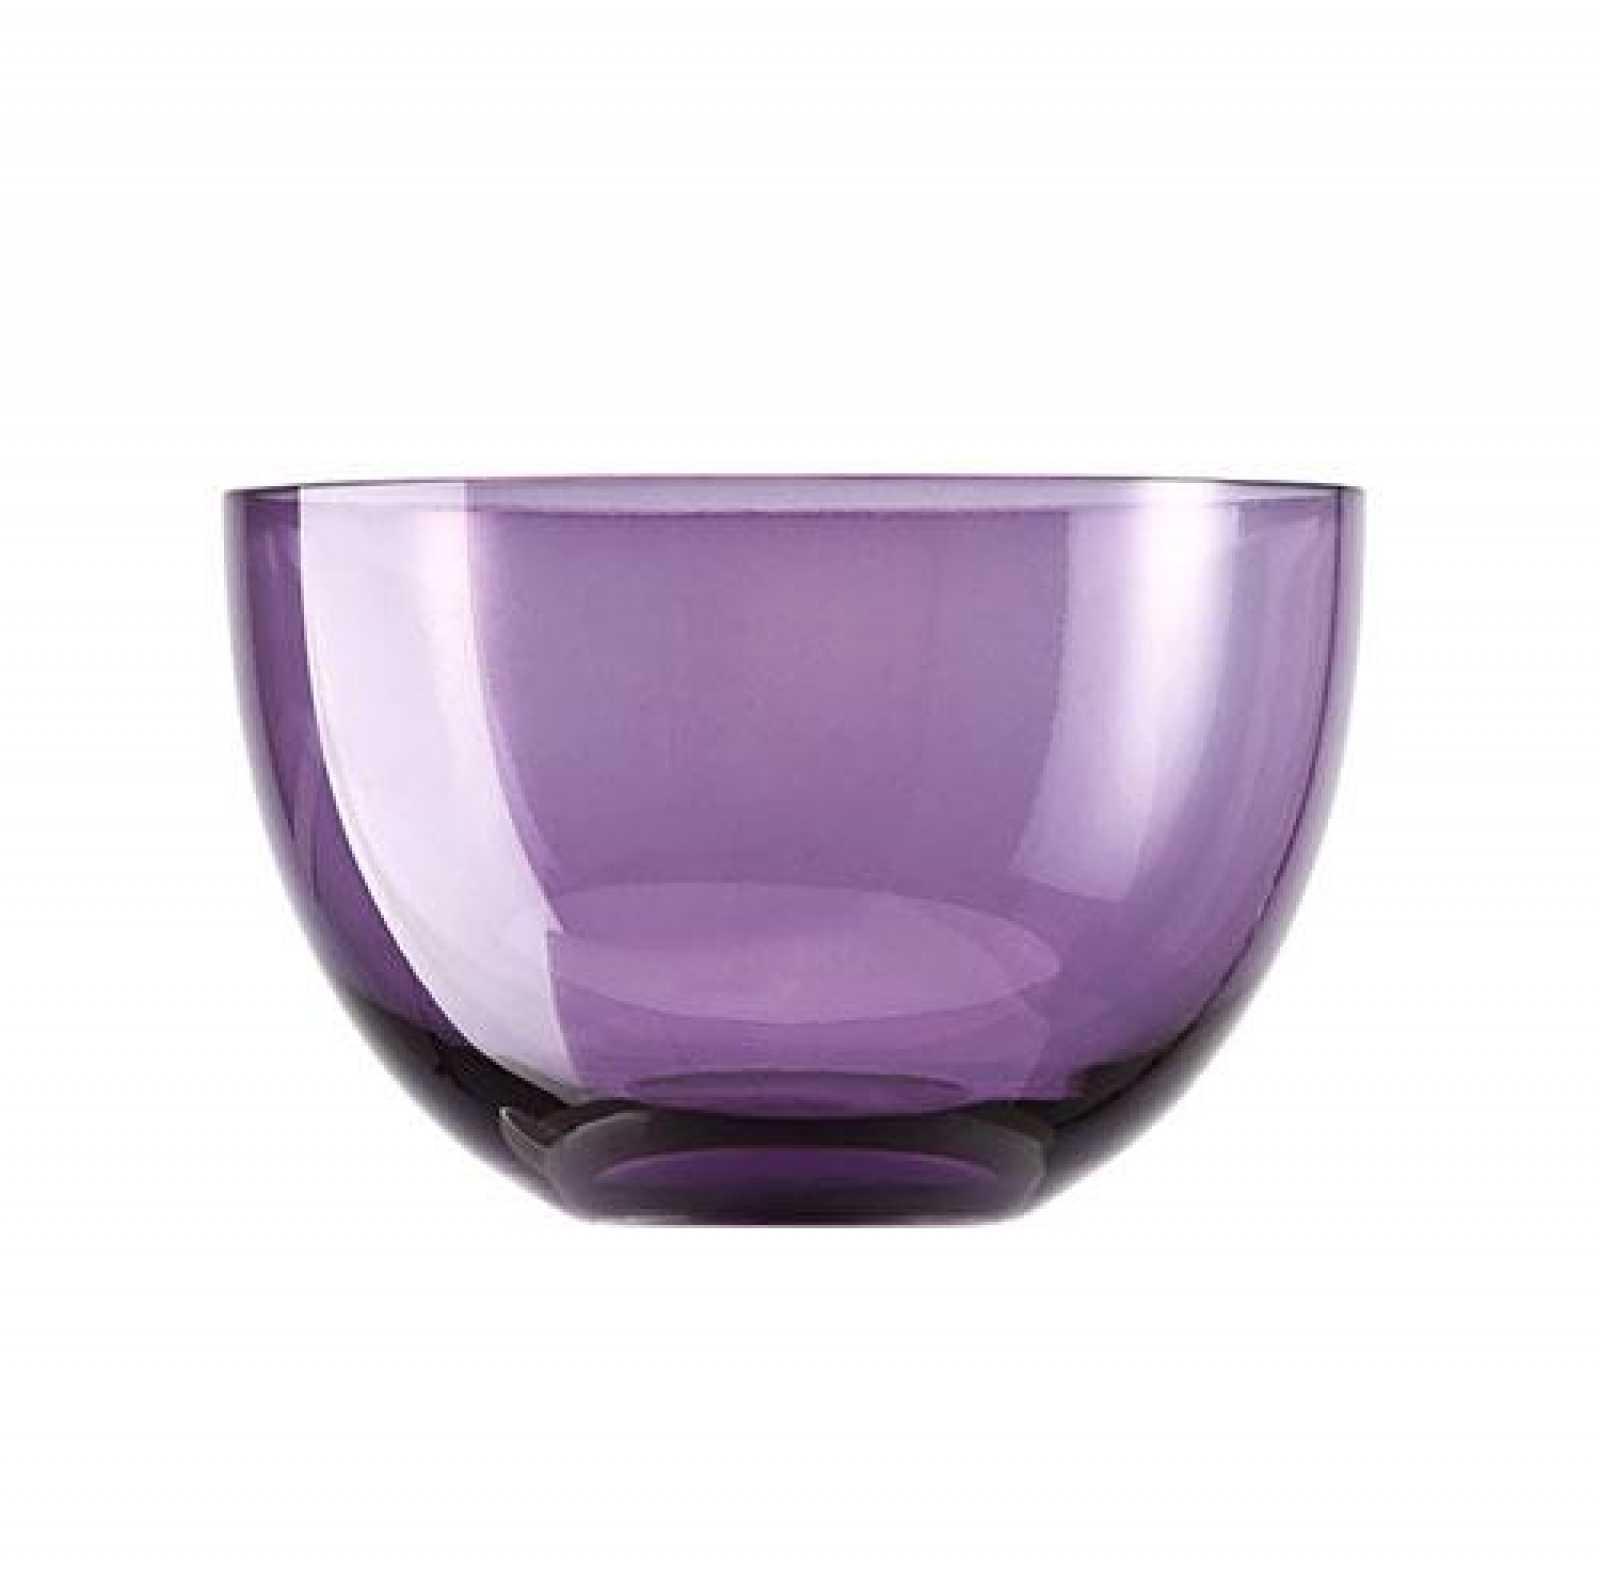 Онлайн каталог PROMENU: Пиала стеклянная Rosenthal SUNNY DAY, диаметр 12 см, фиолетовый Rosenthal 69034-408531-45312